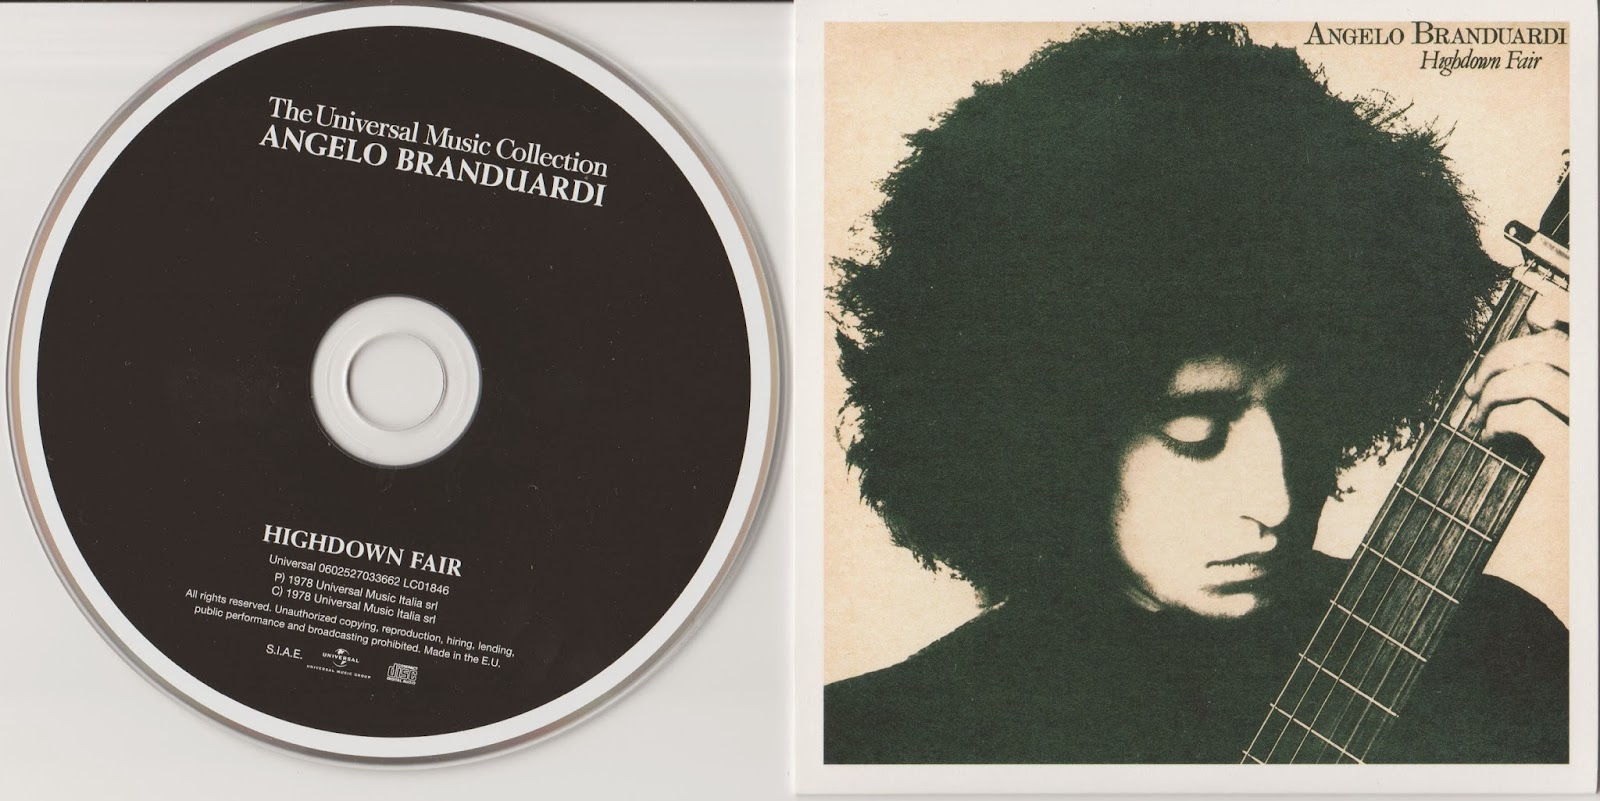 Angelo Branduardi Album 06:44 Angelo Branduardi